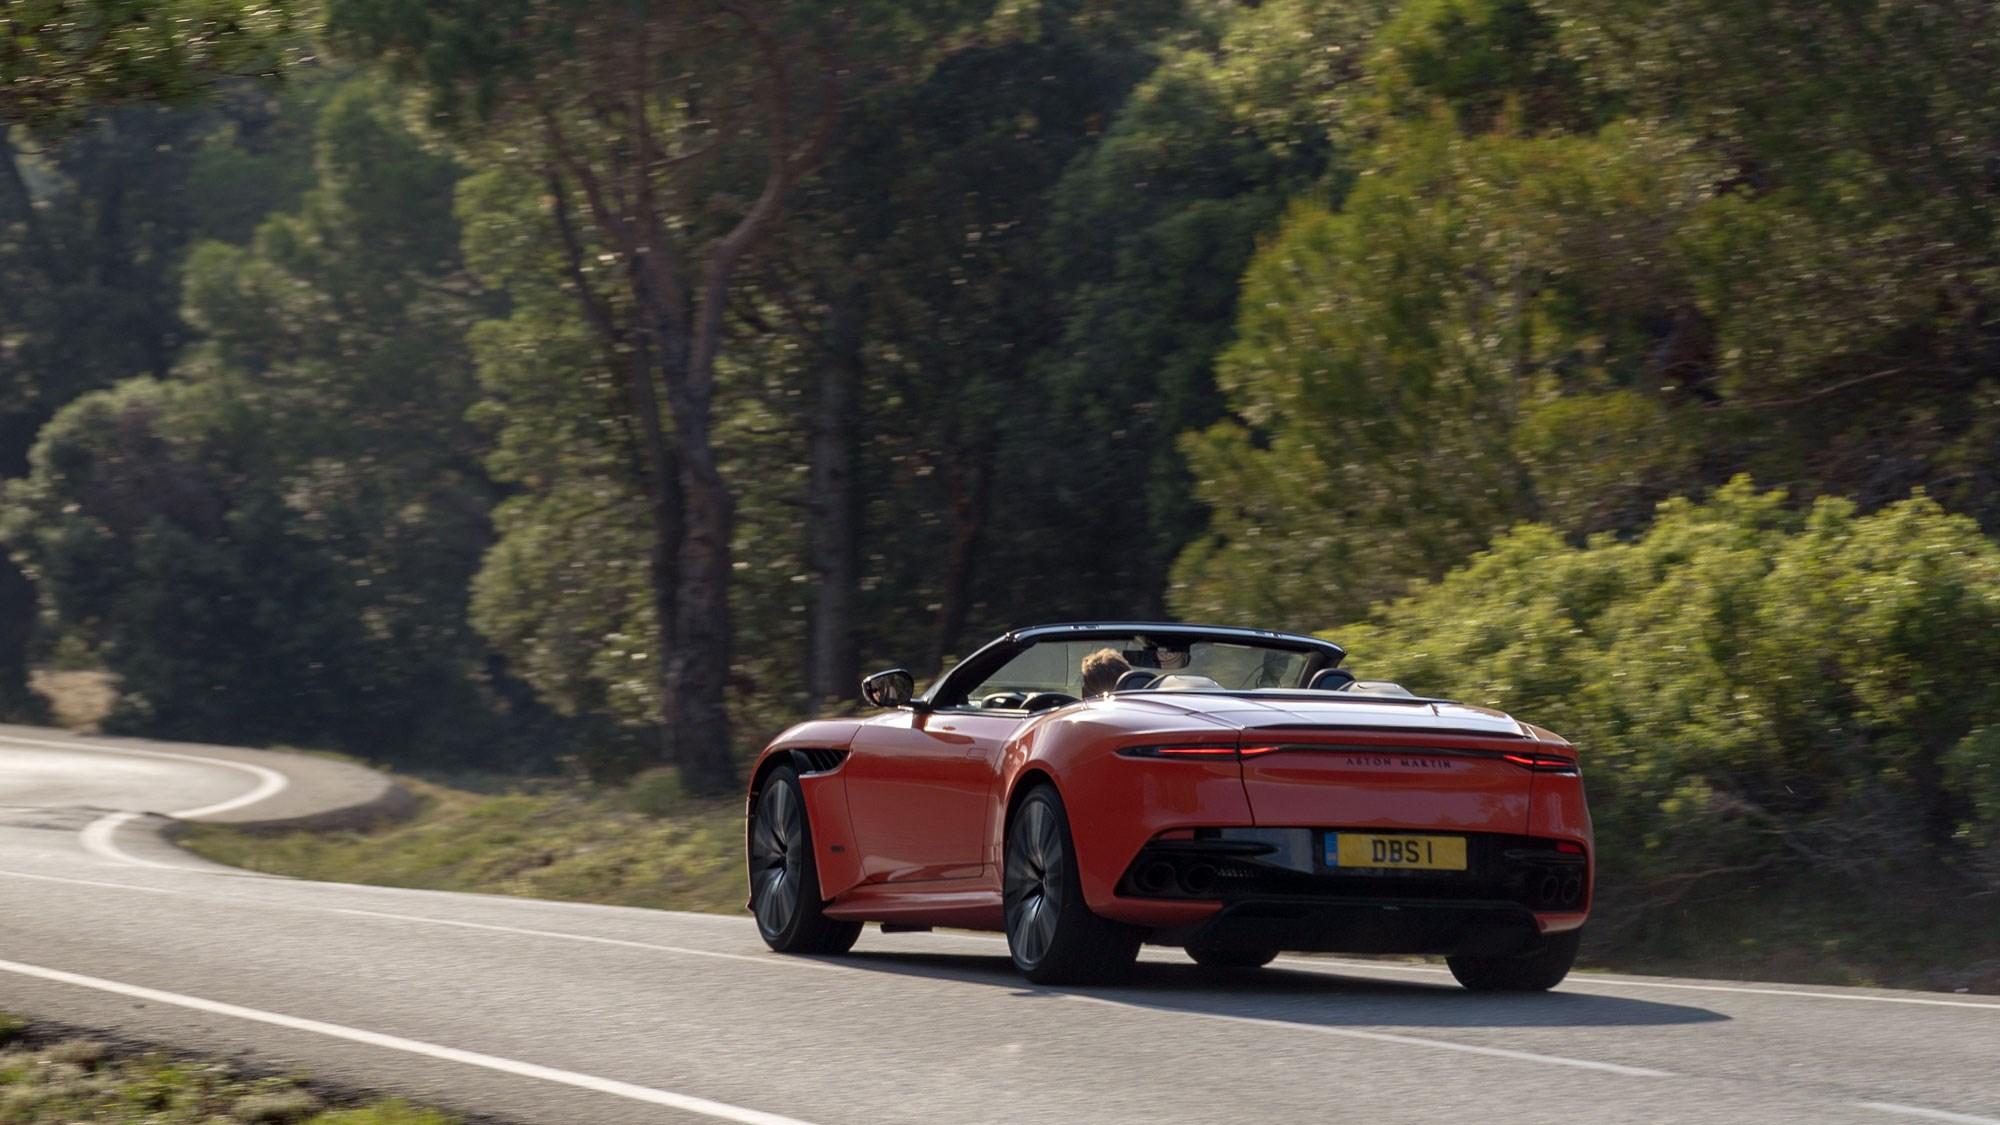 Aston DBS Superleggera rear tracking